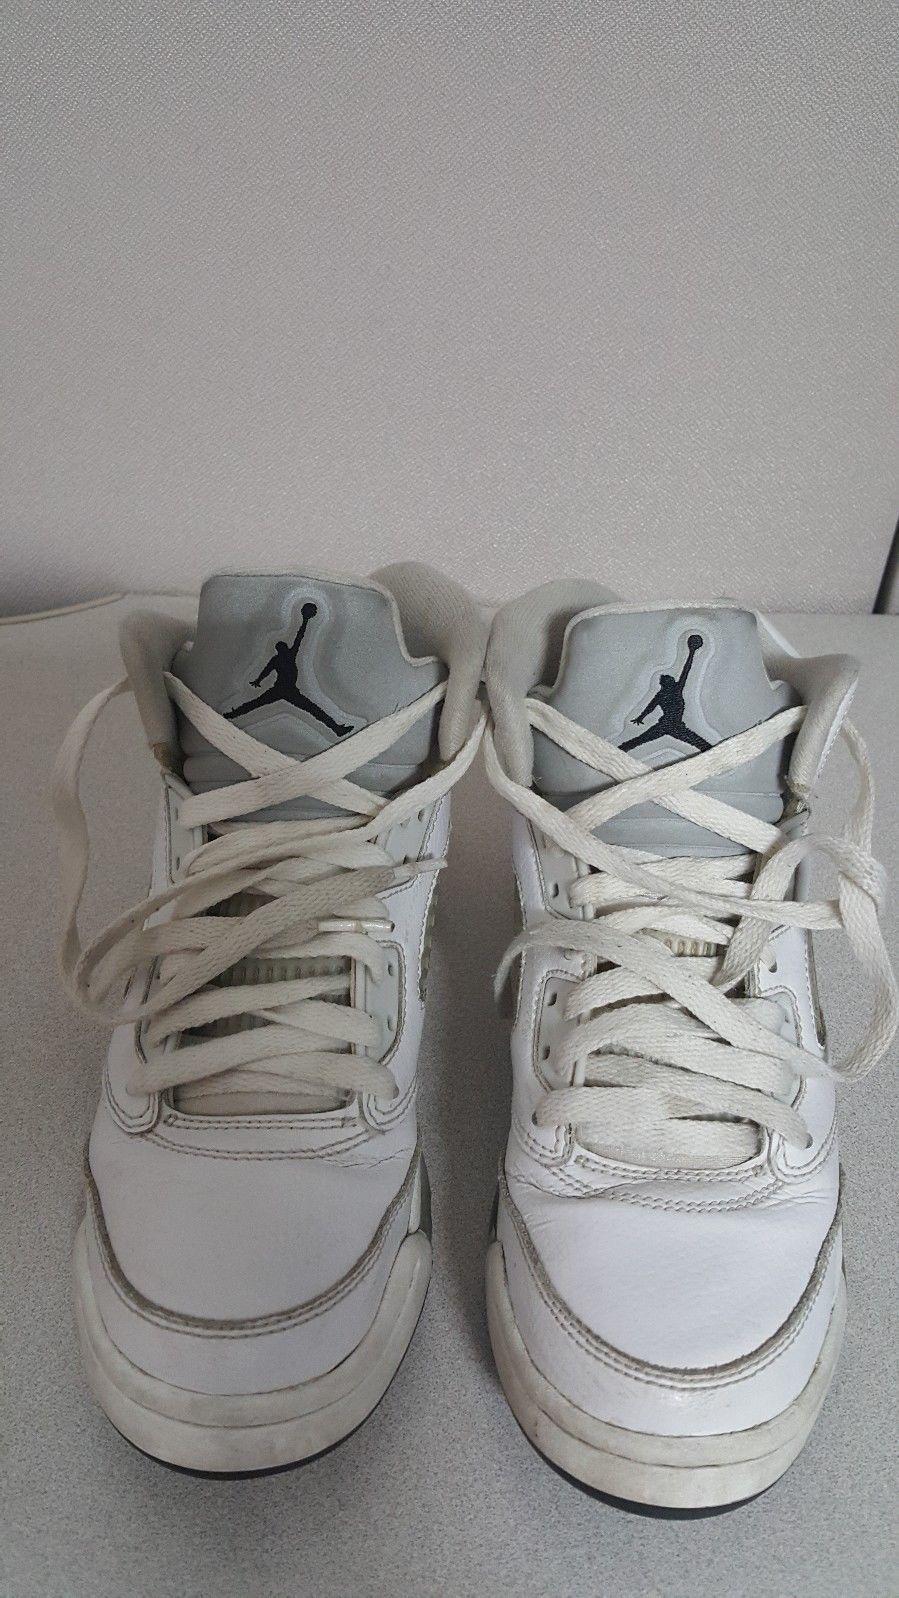 31dd3d48b5cb AIR JORDAN 5 V Retro BG White Basketball Shoe Pre Owned Size 5.5 440888-130